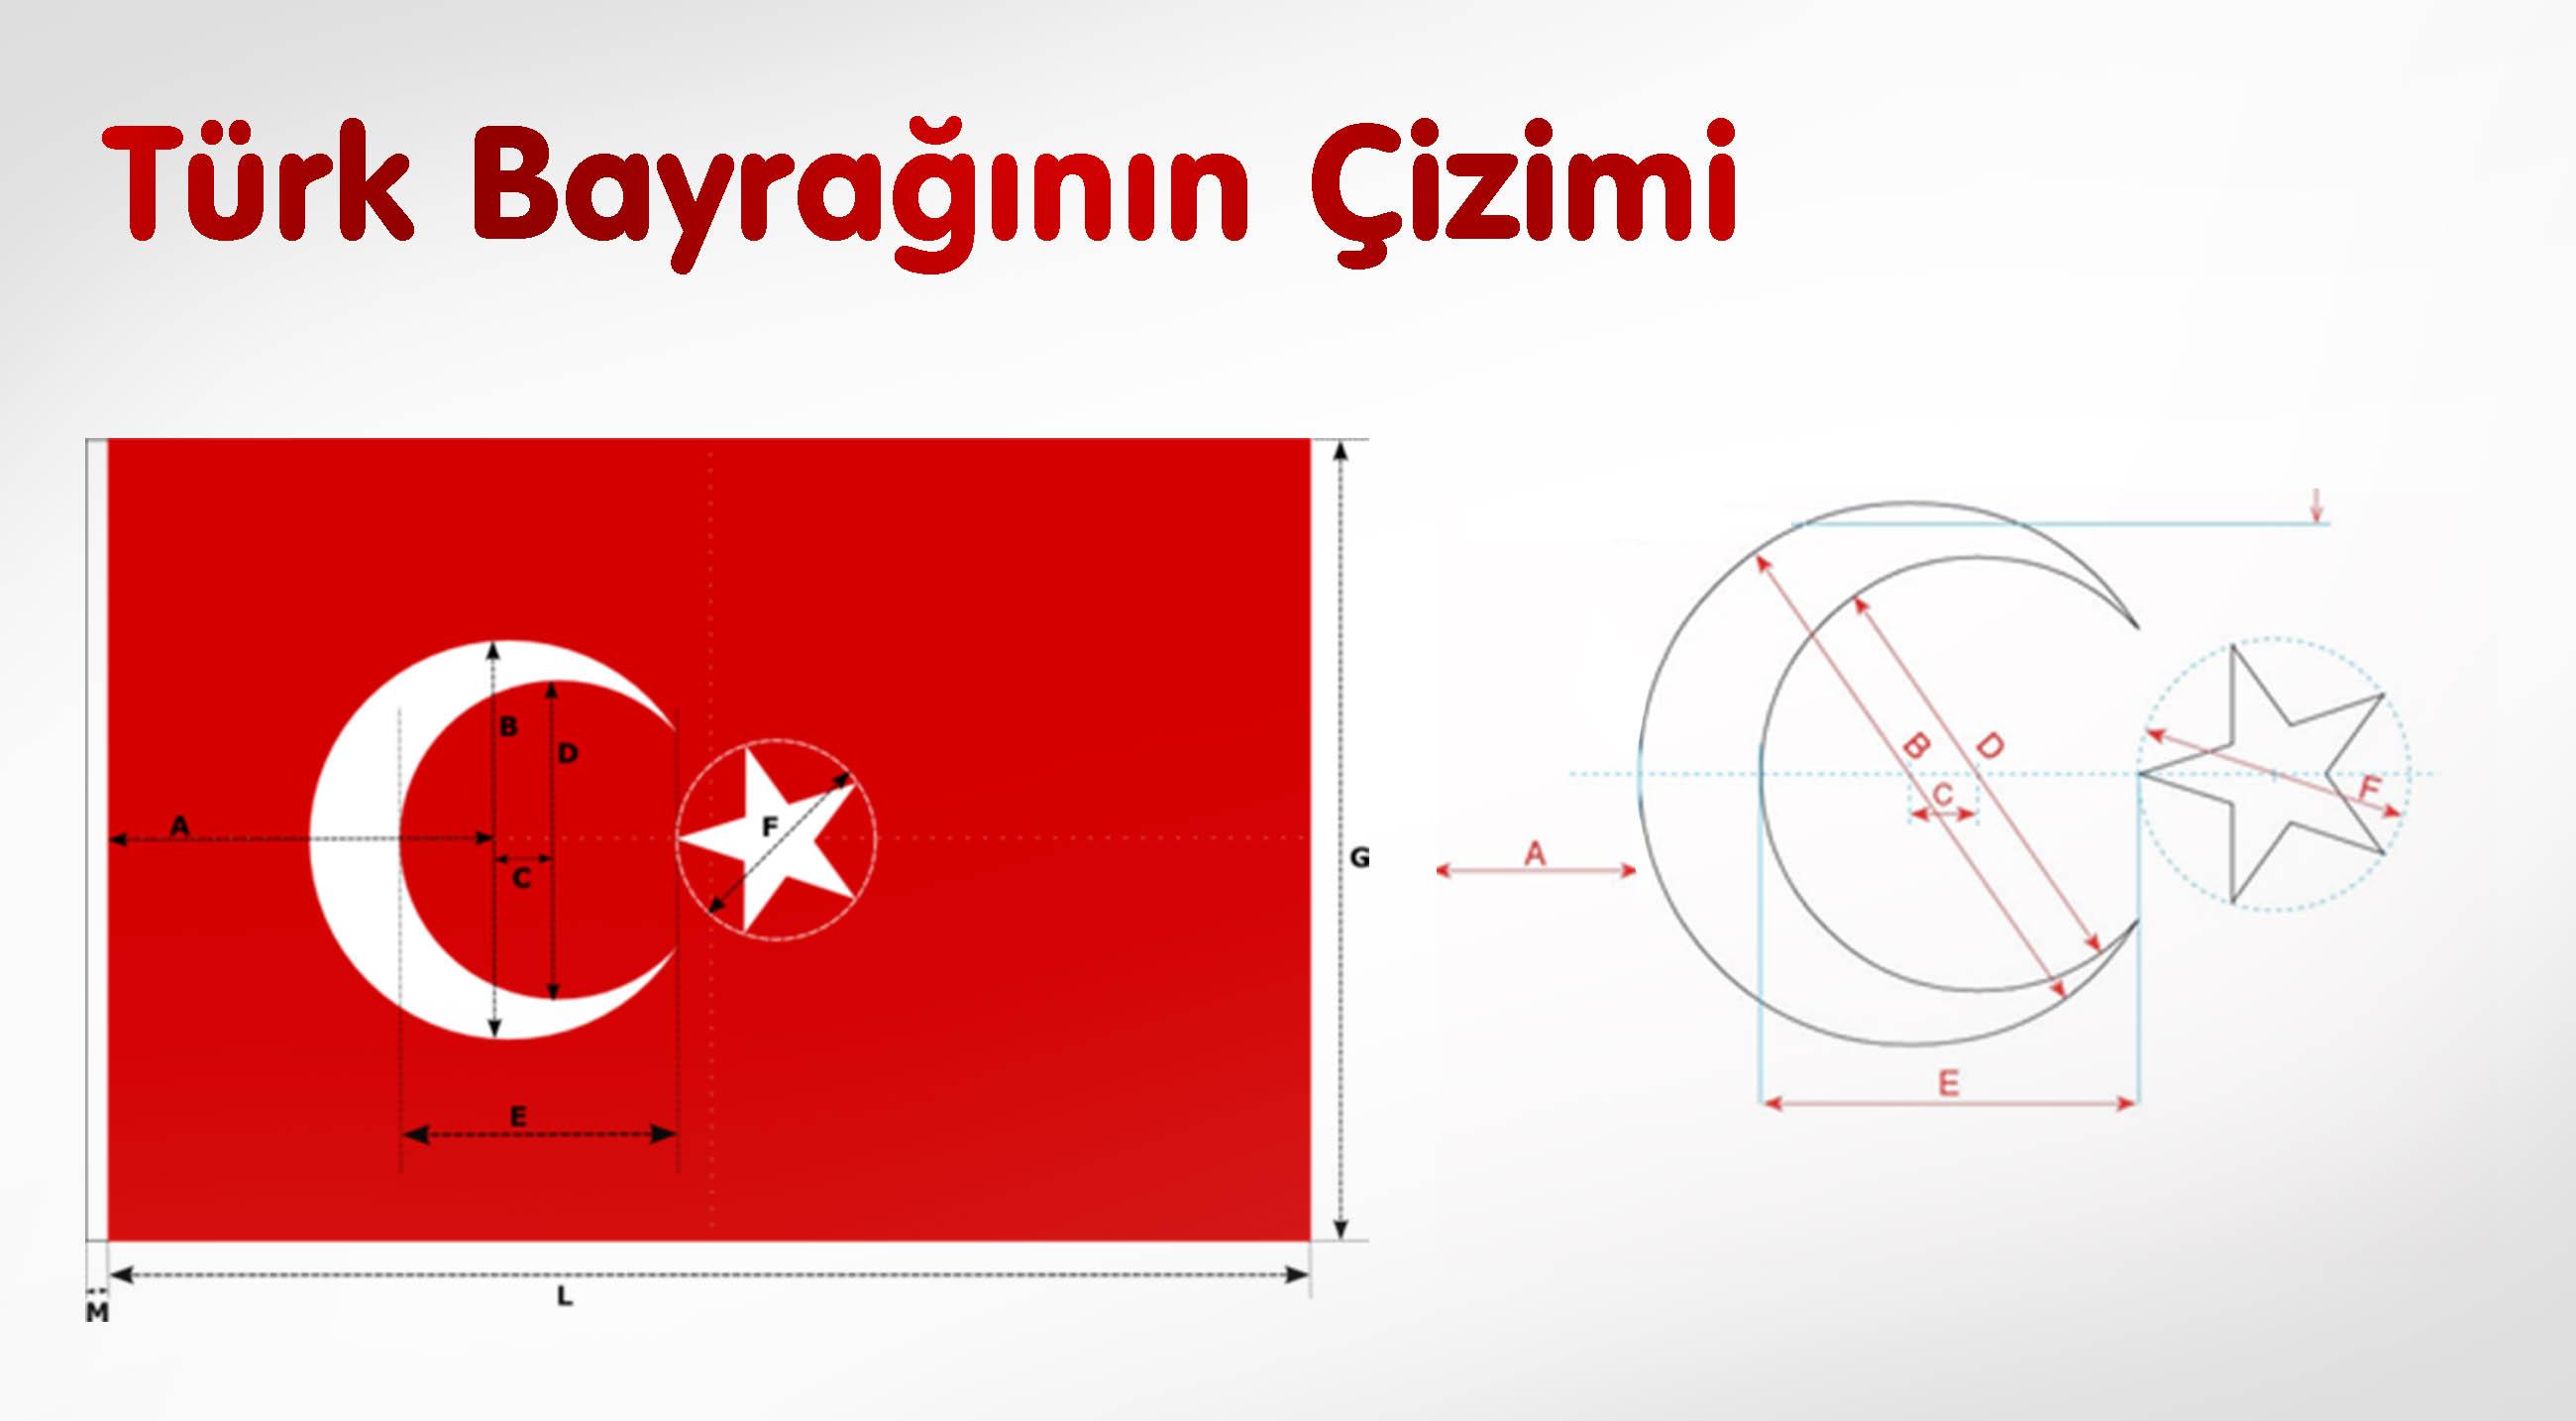 Türk Bayrağının Çizimi